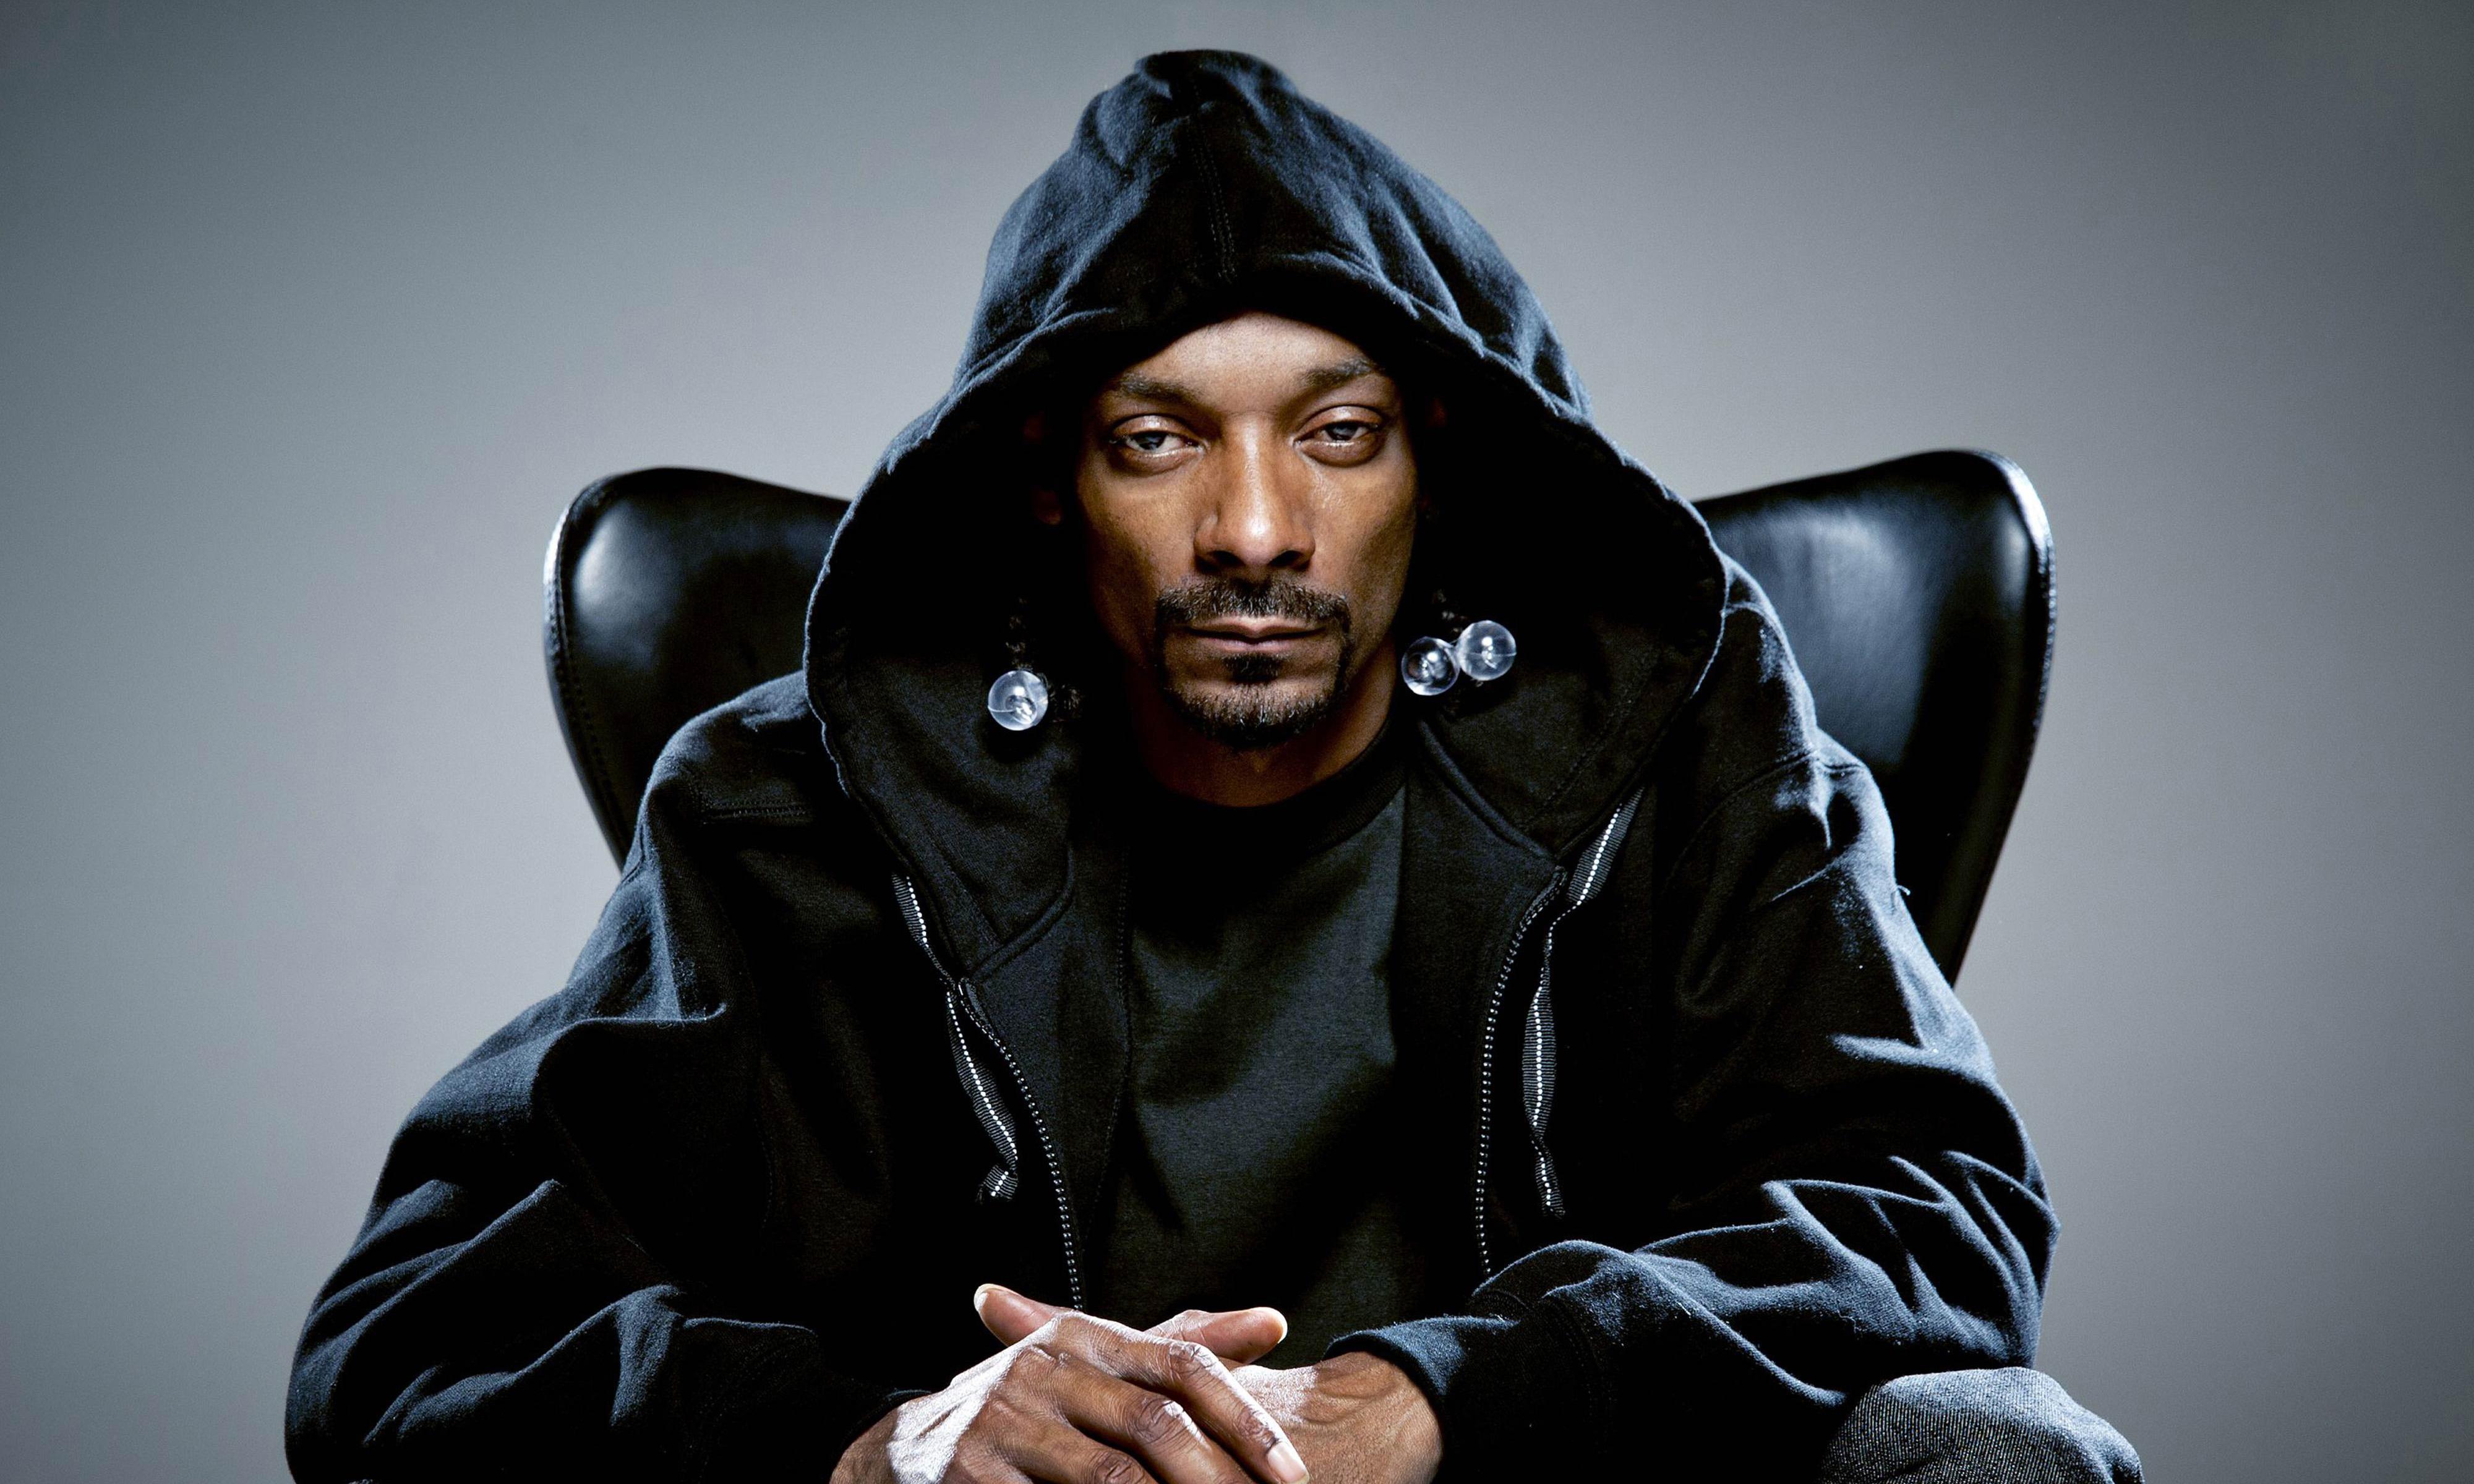 Snoop Dogg 发布新专辑同名主打歌《I Wanna Thank Me》